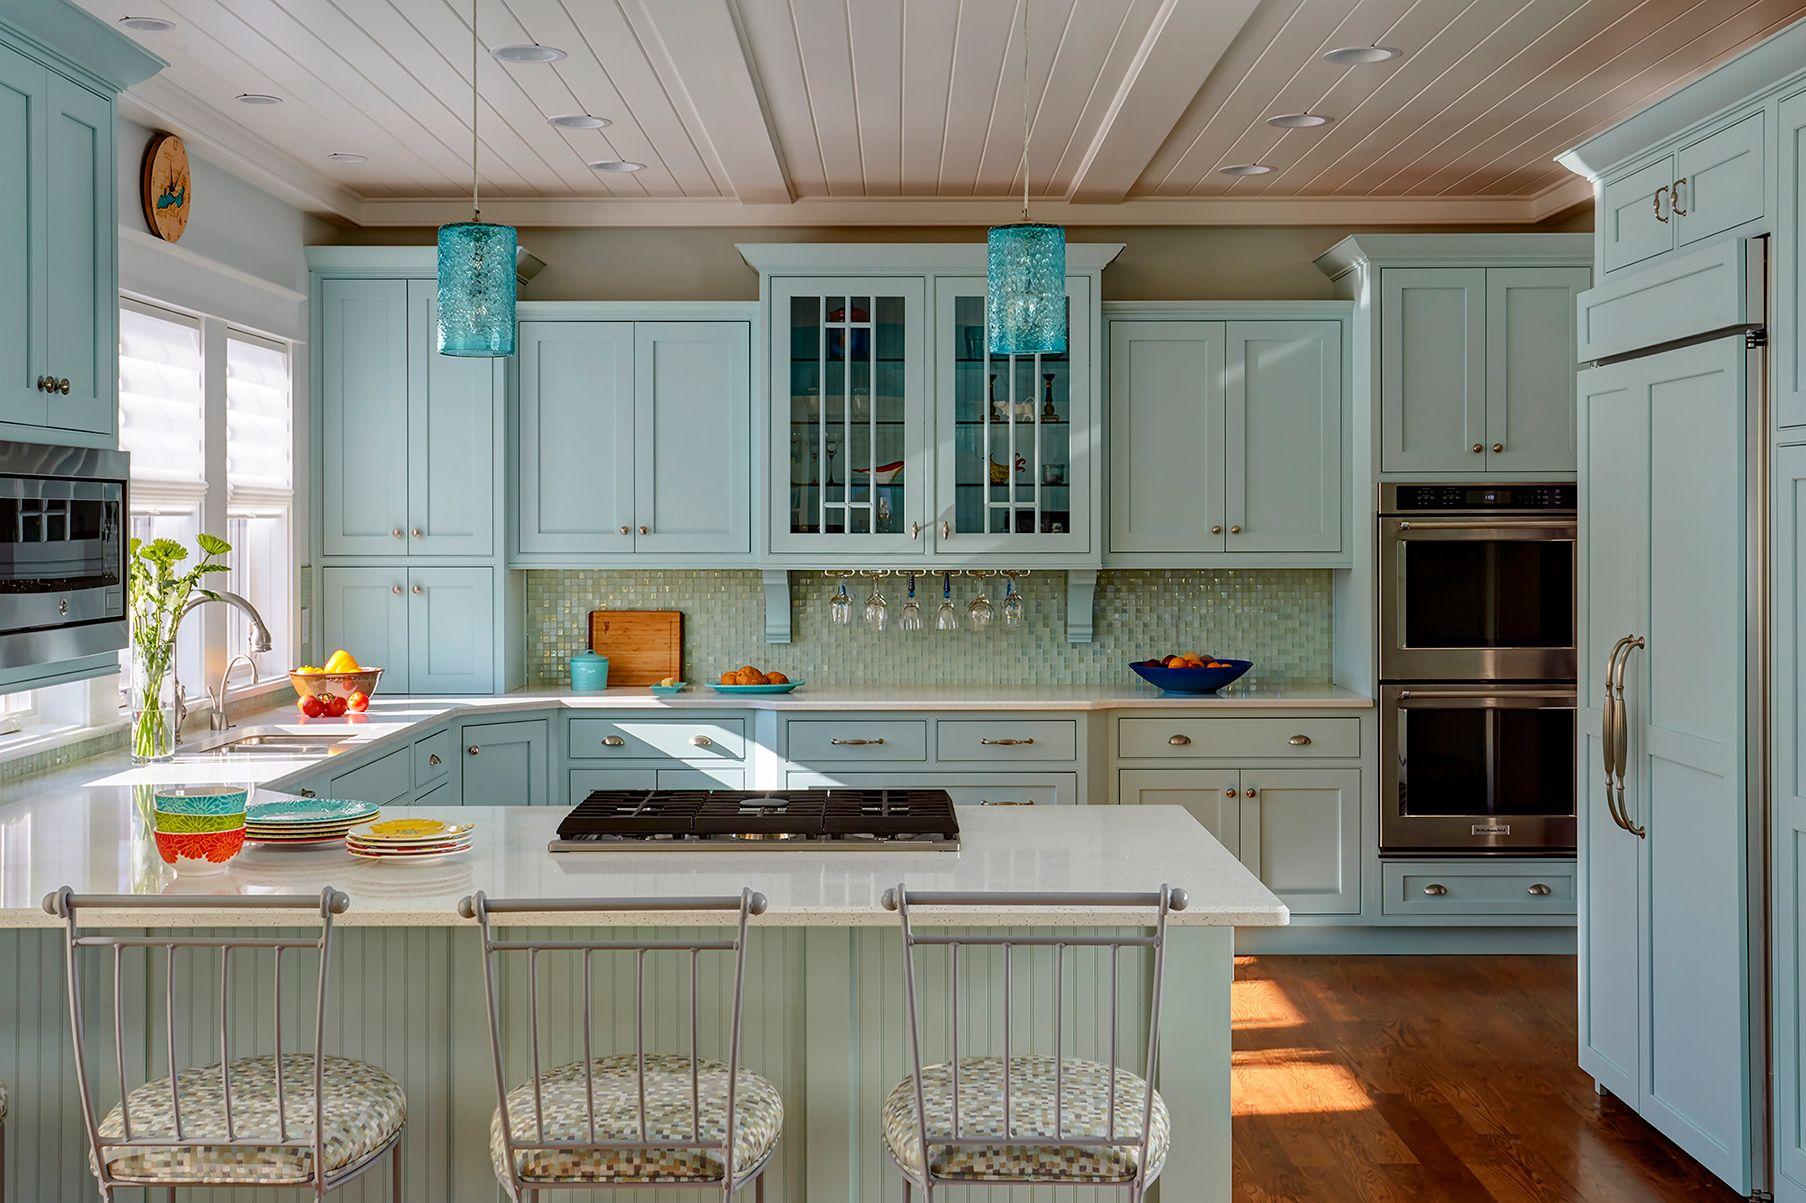 Kitchen Design Alpharetta Ga Simple Kitchen Design Contemporary Kitchen Design